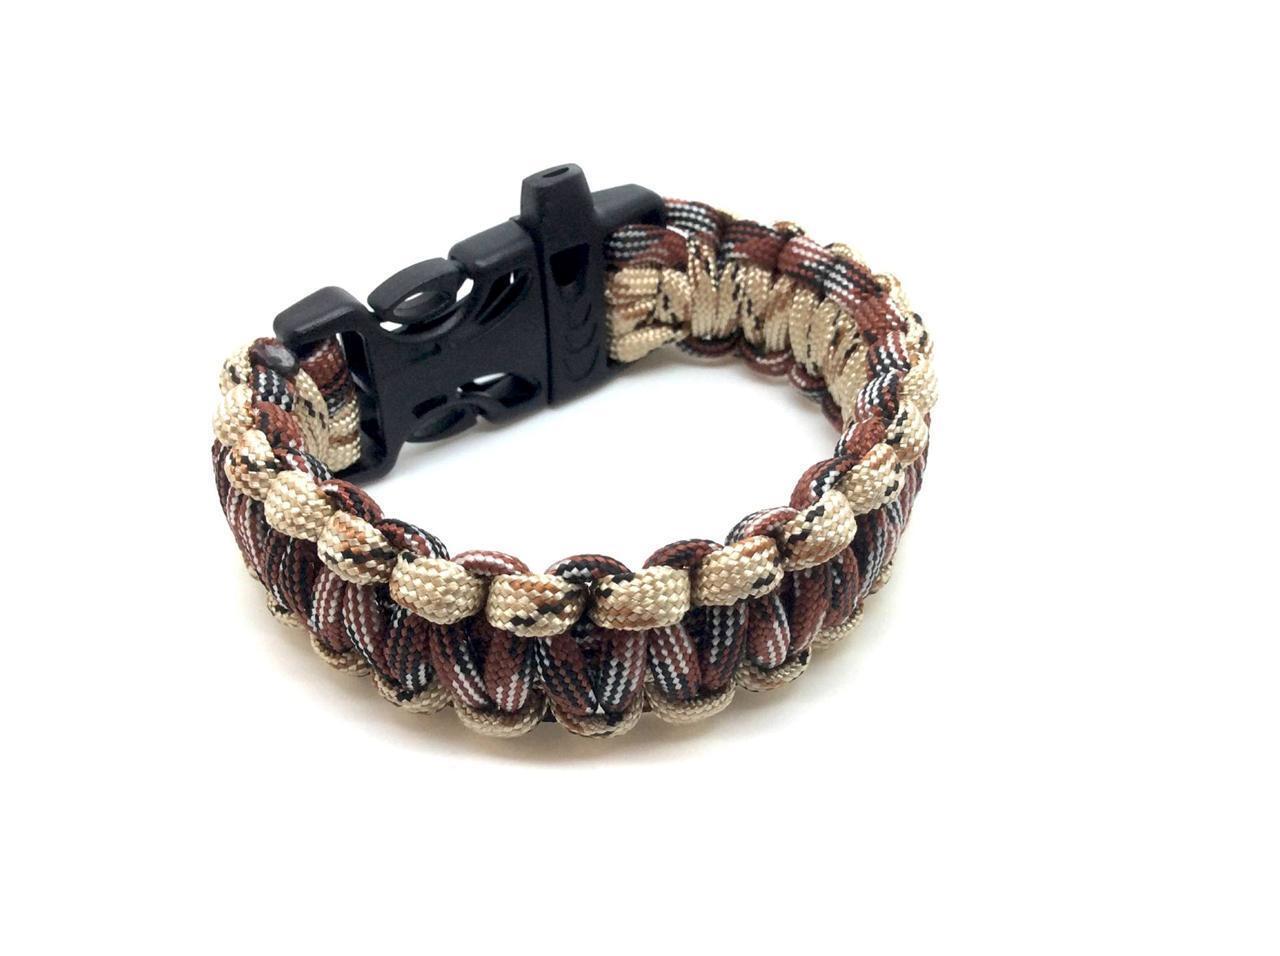 Paracord Bracelet Outdoor Camping Survival Survival Survival Bracelet Bracelet Désert numérique 1b4c36